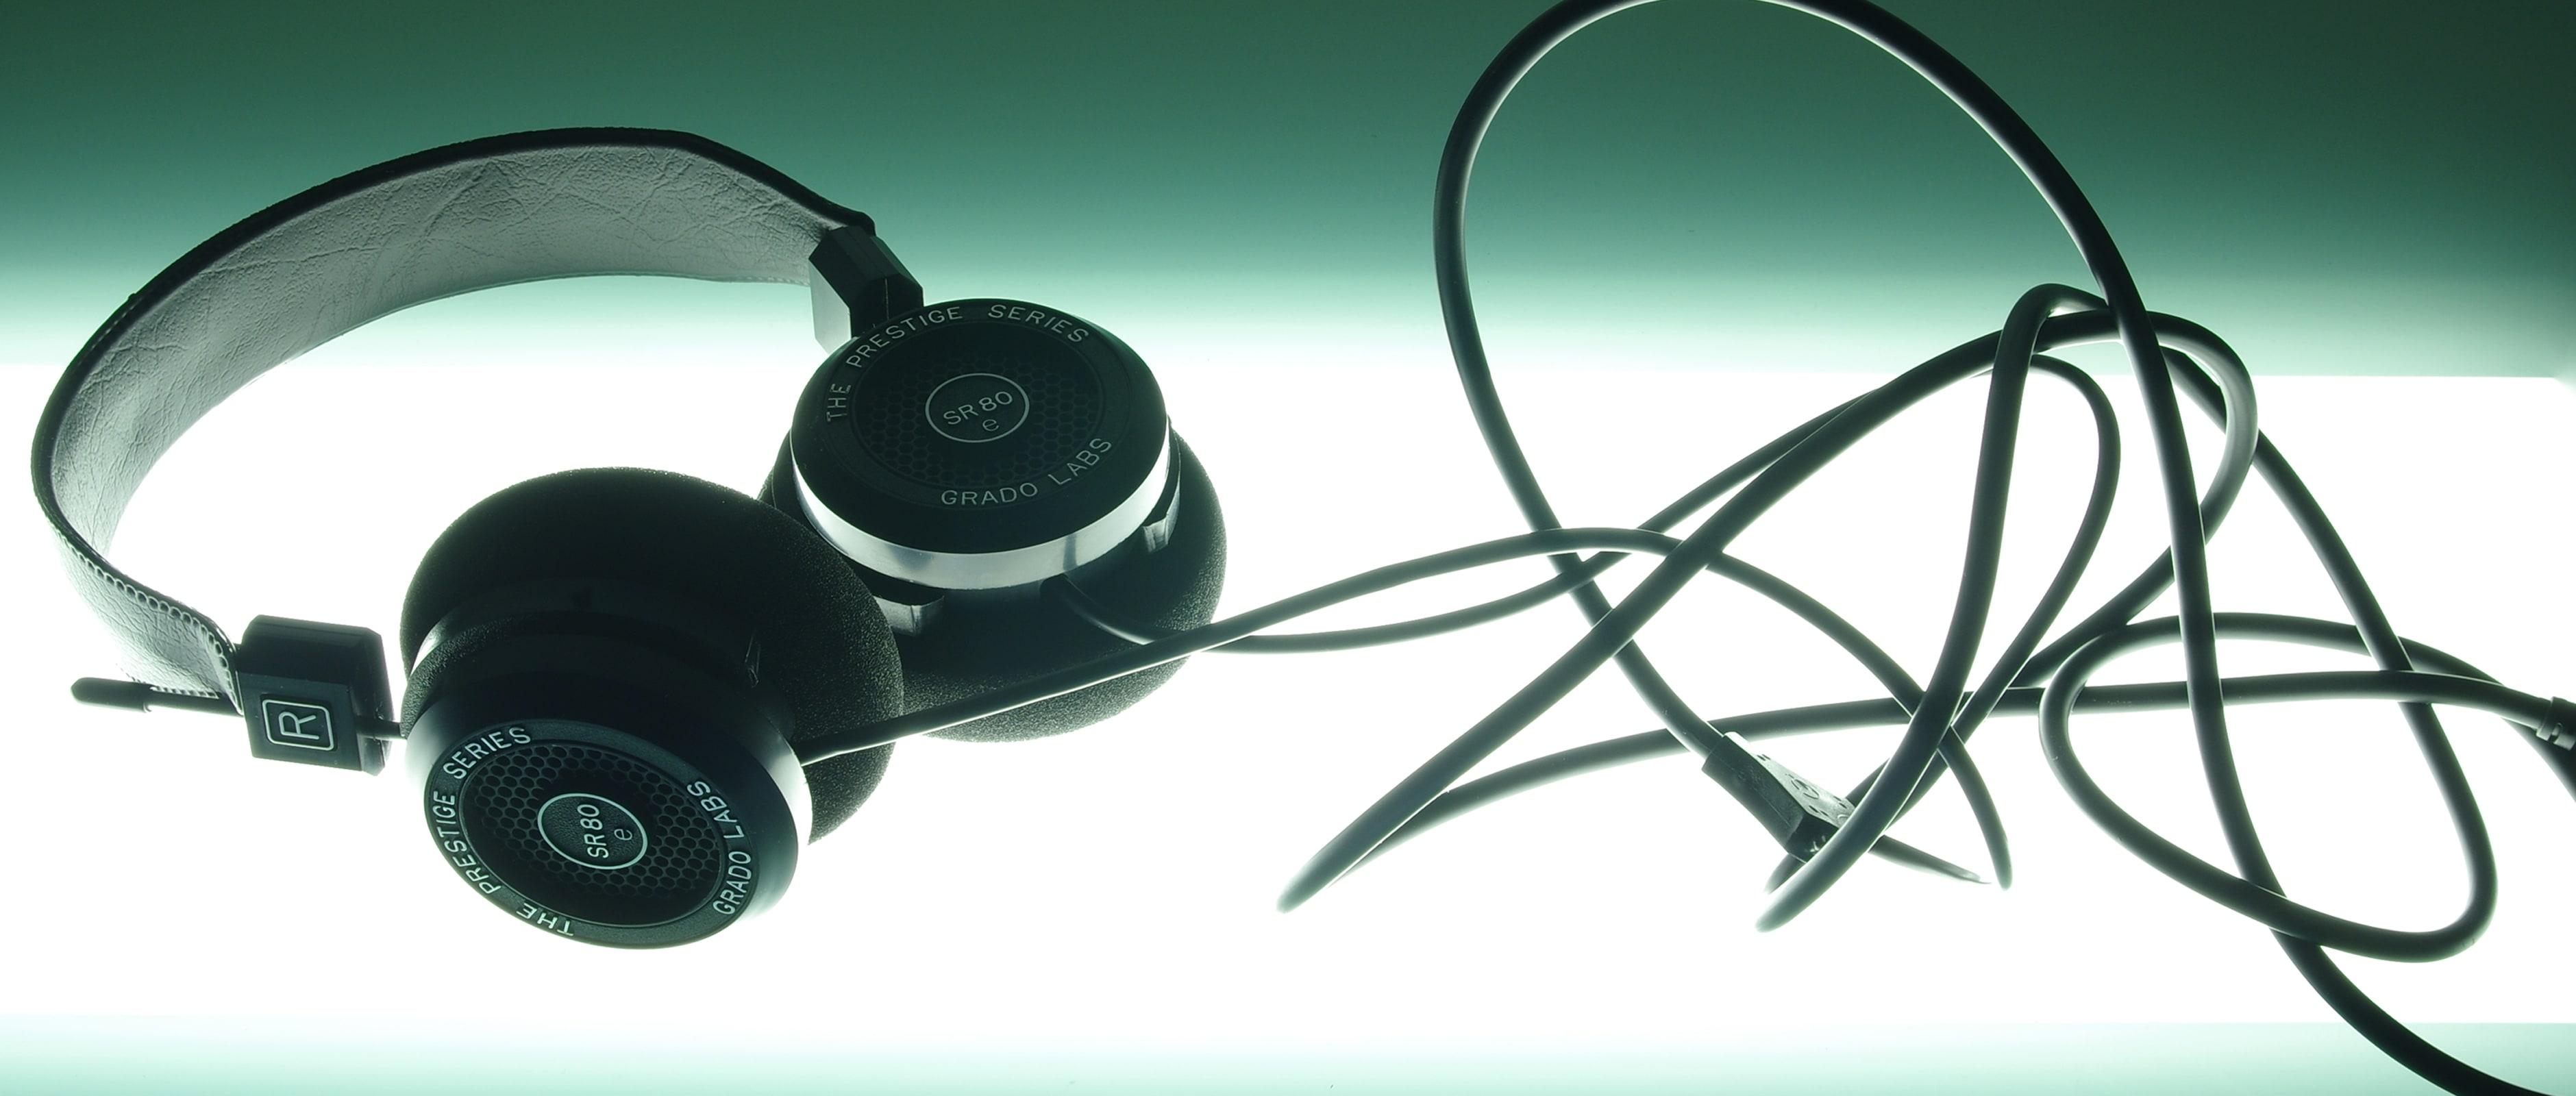 Grado's prestige S80e open-backed headphones